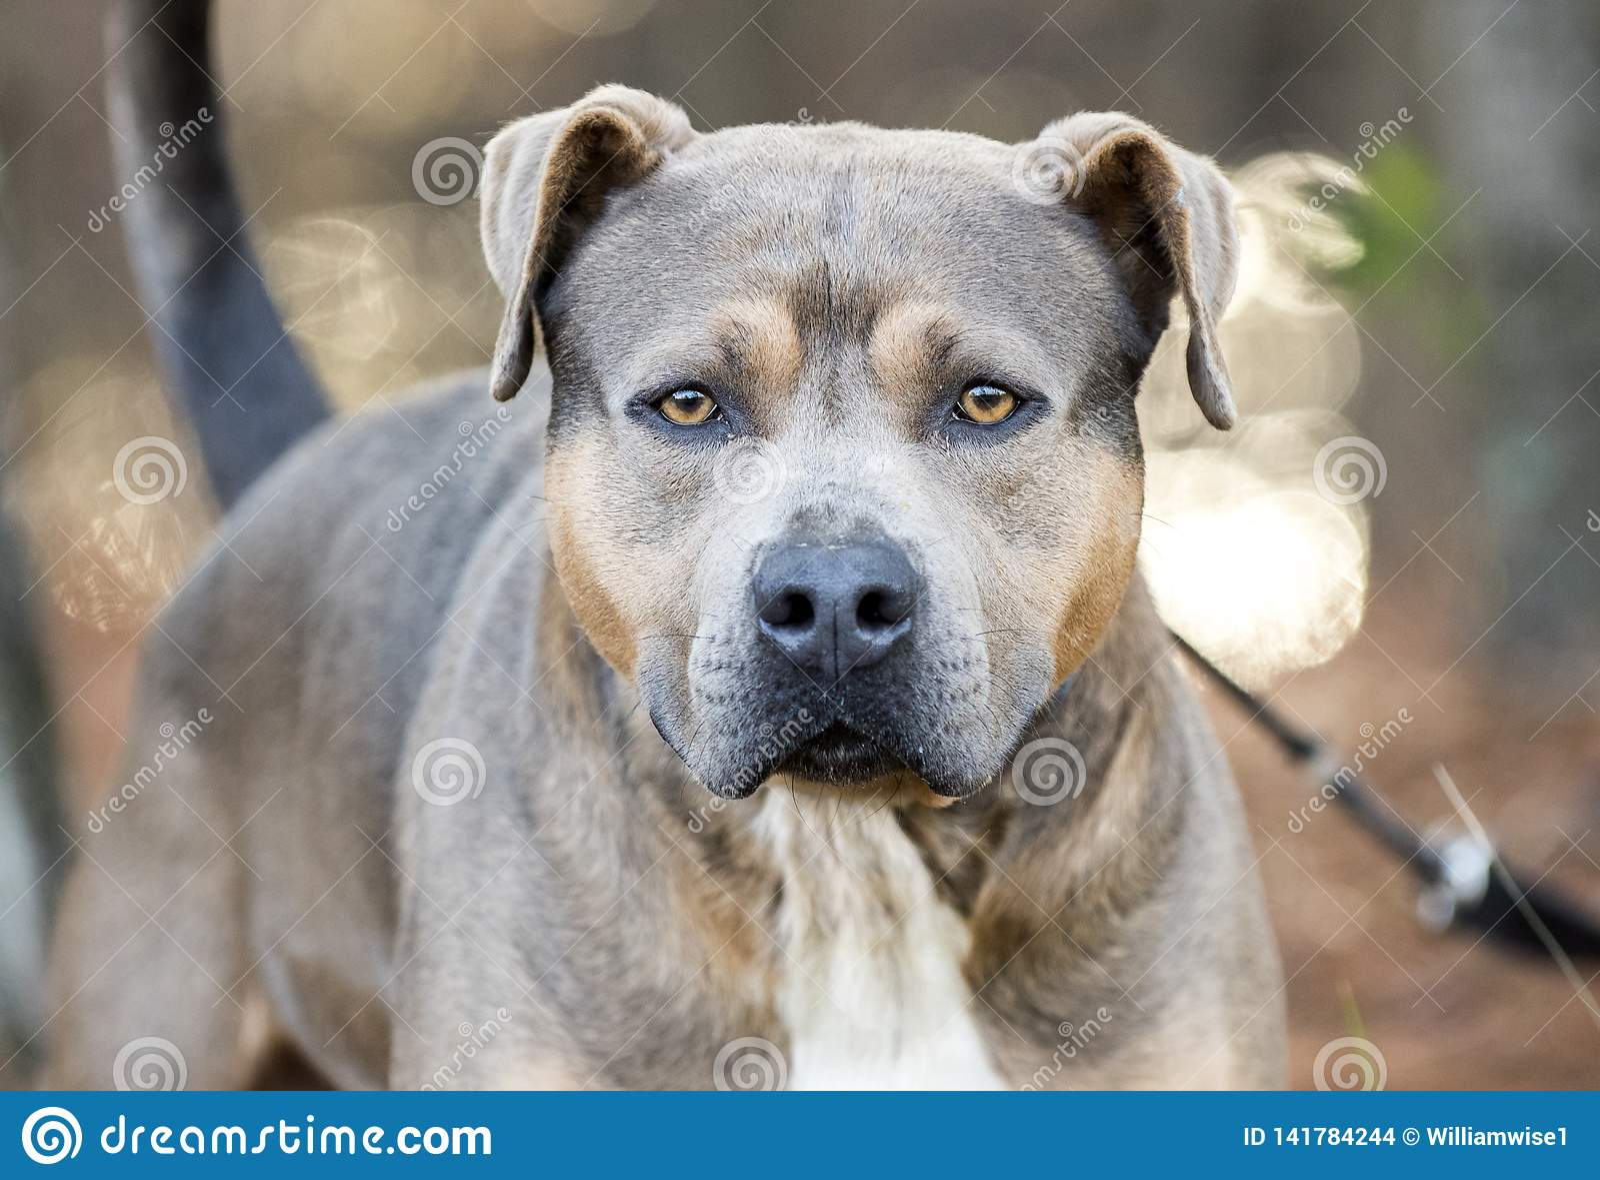 Brown Pit Bull Terrier dog